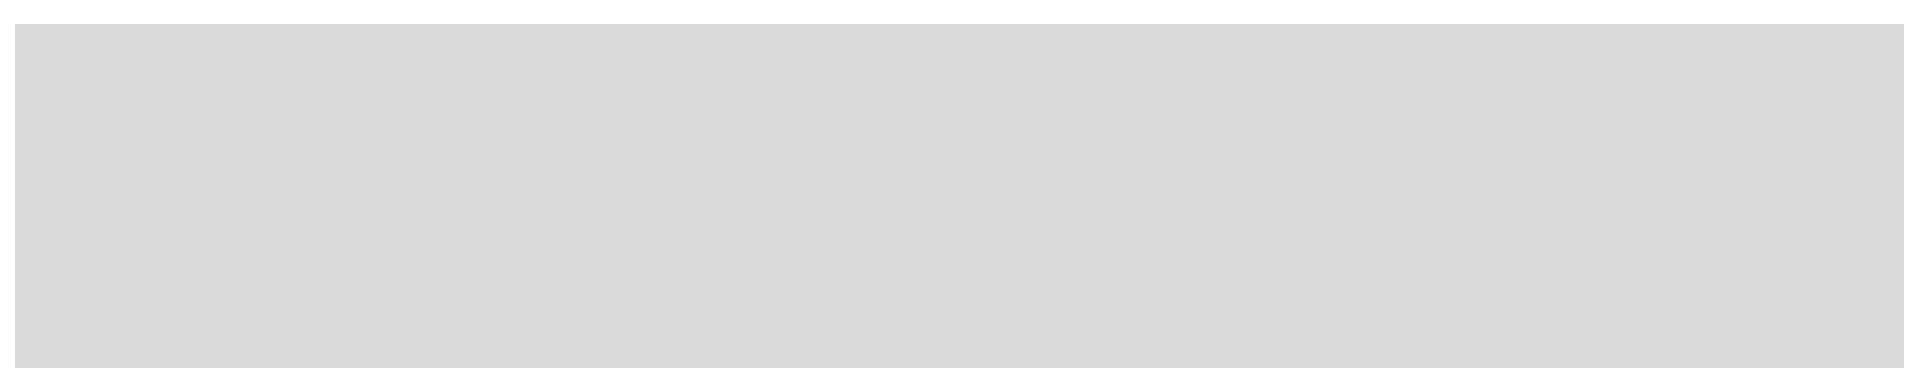 monk studeyo logo